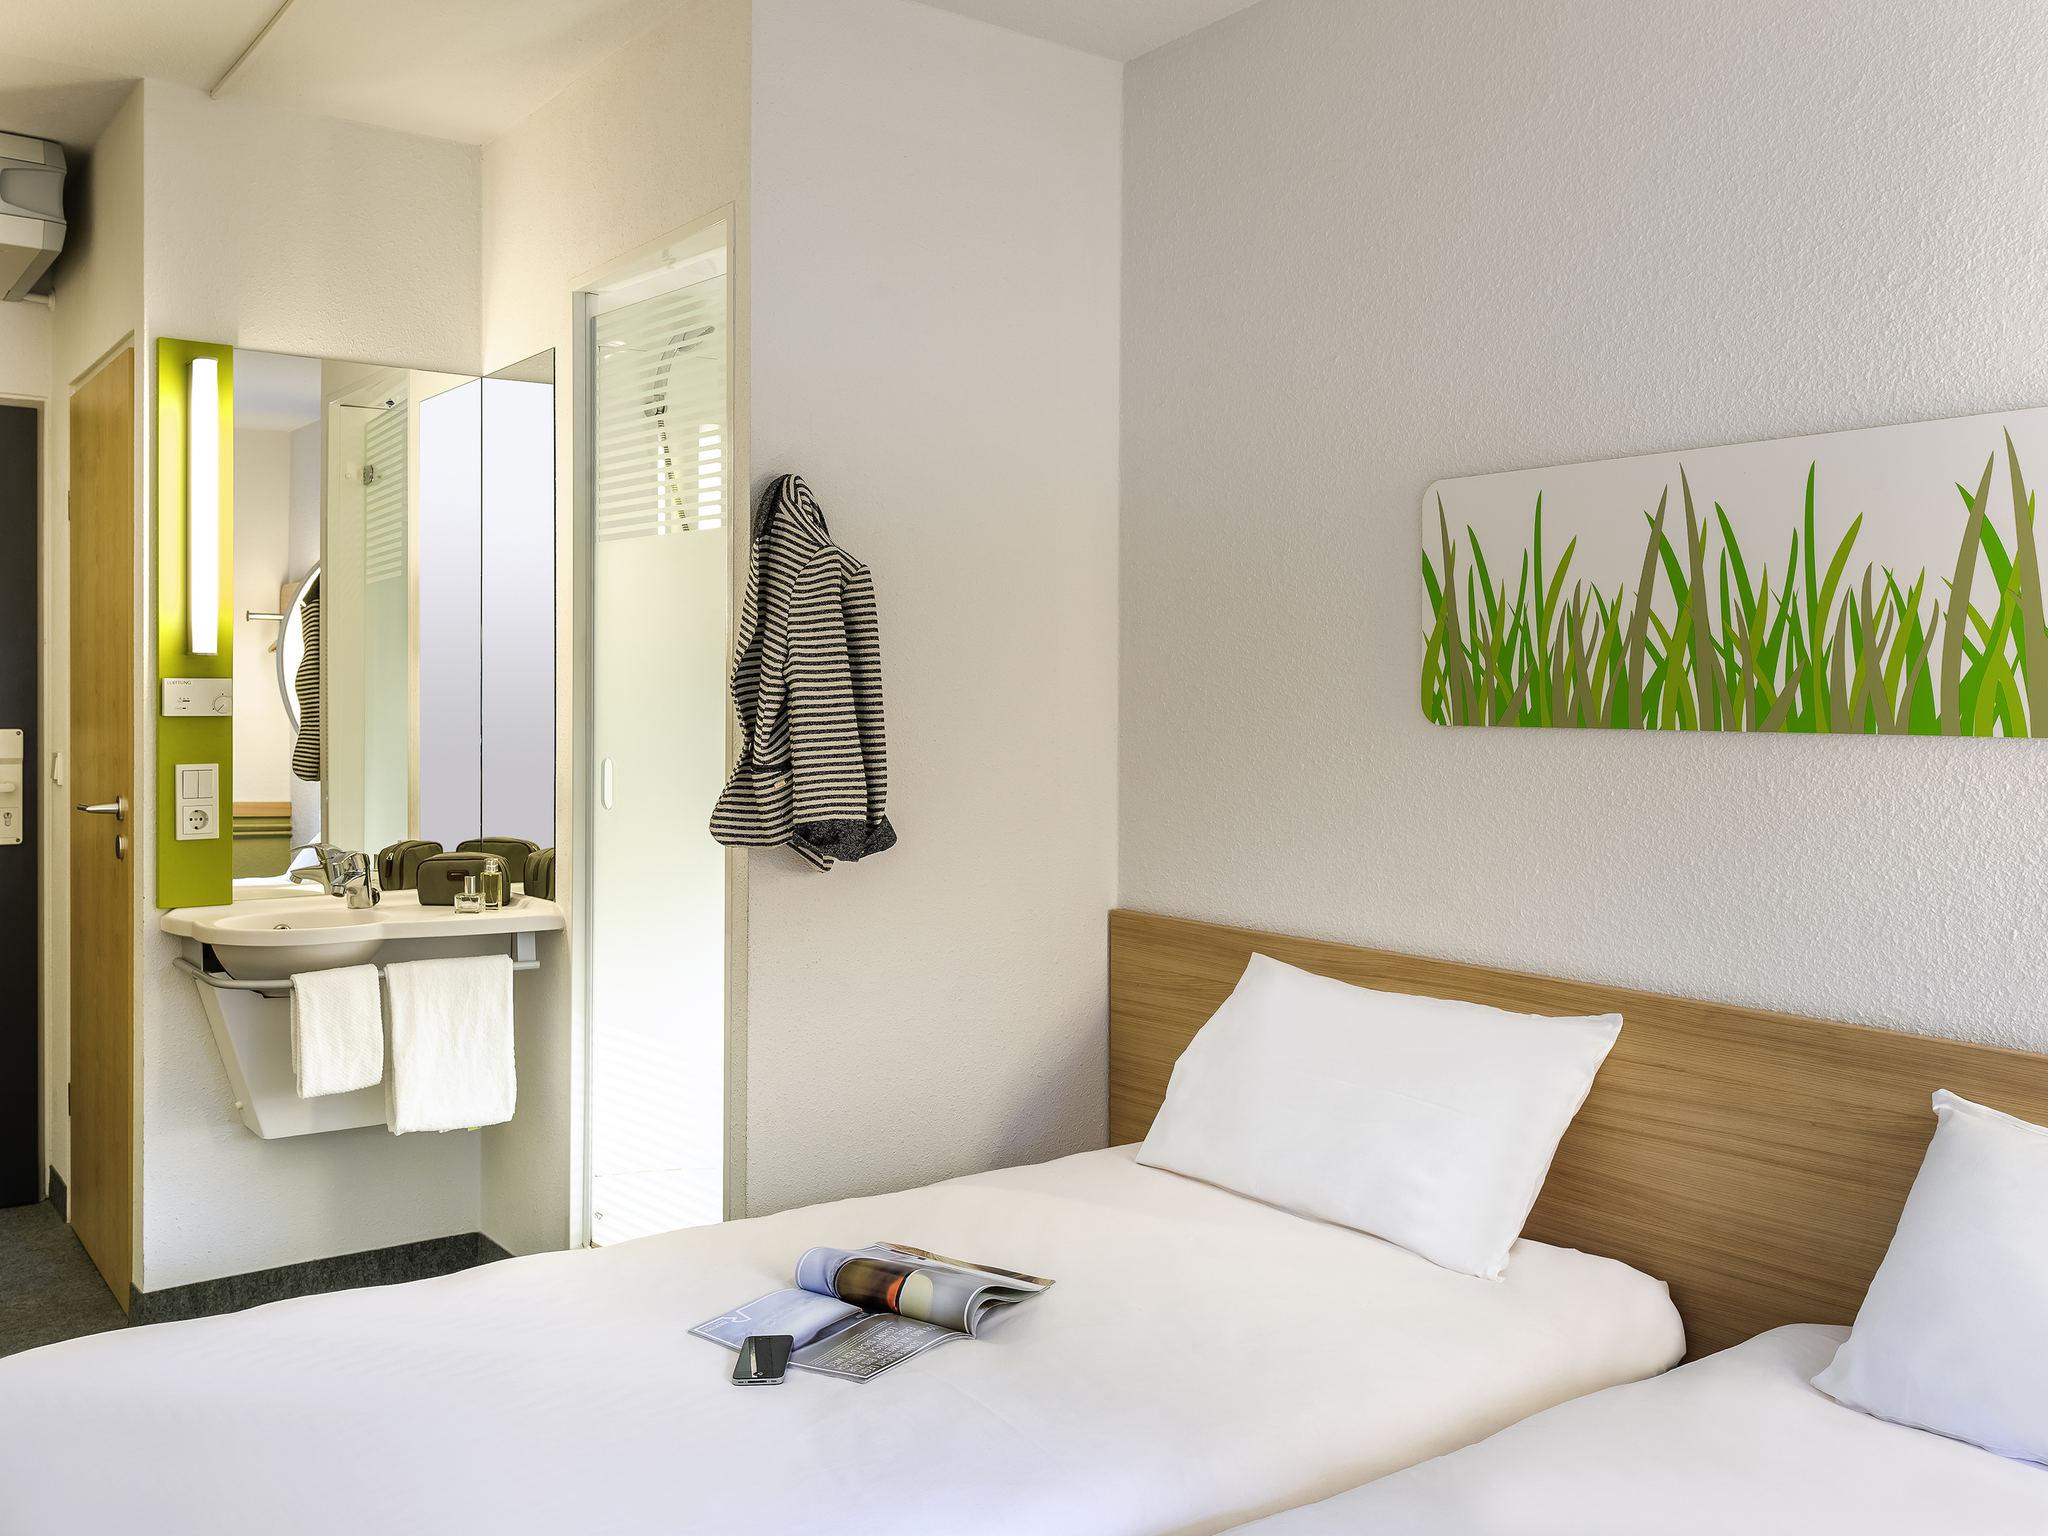 Cheap Hotel Brugge Centrum - ibis budget- Near Station